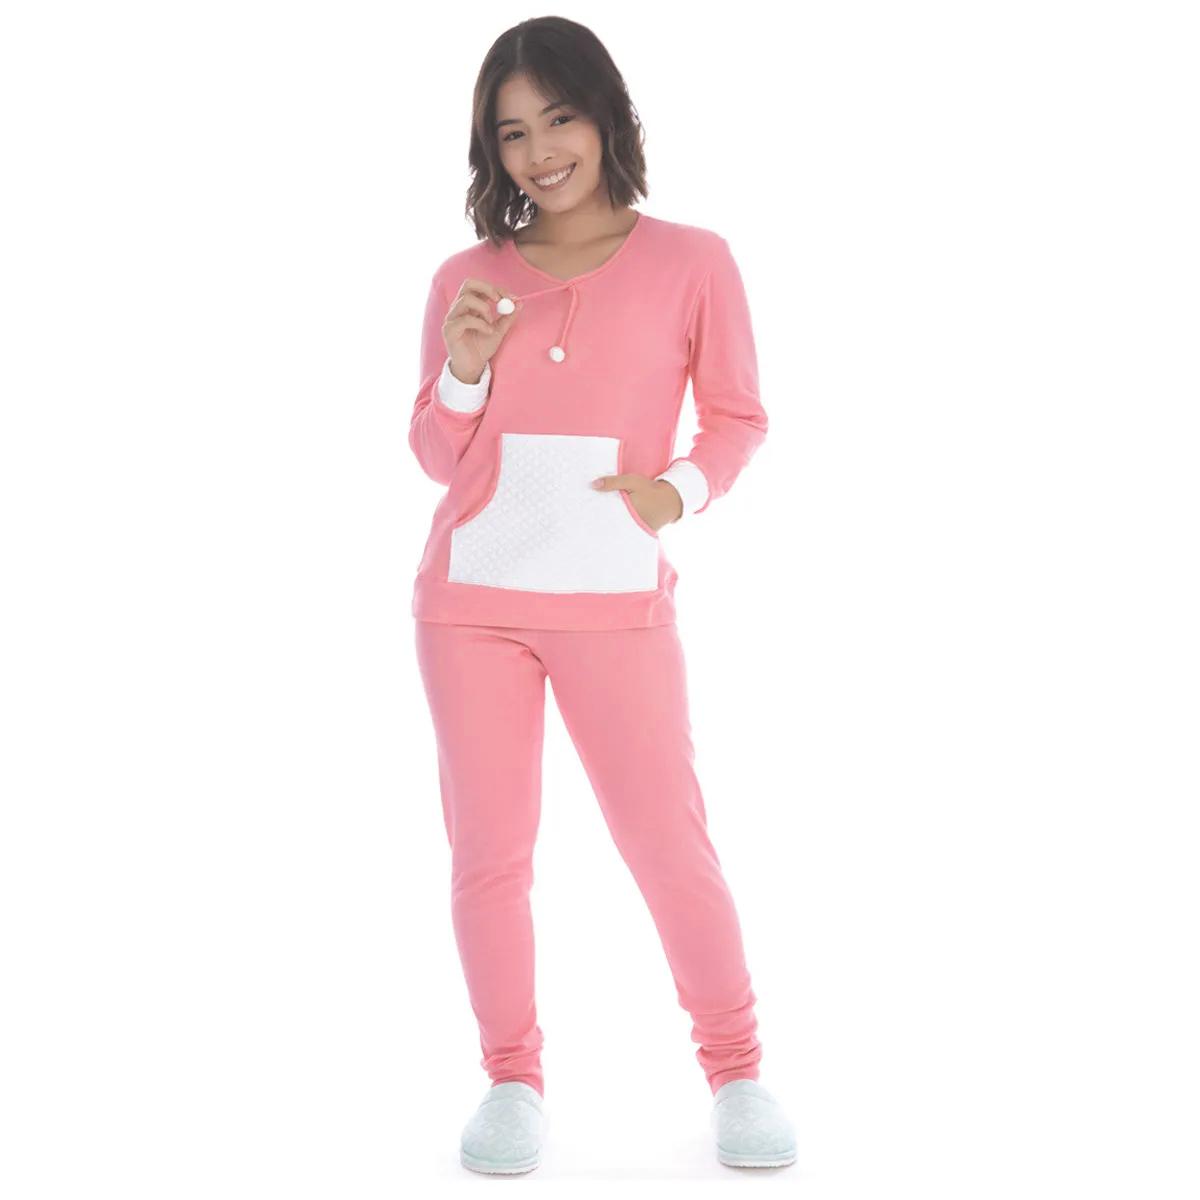 Pijama juvenil para o inverno KANGURU POM-POM Victory